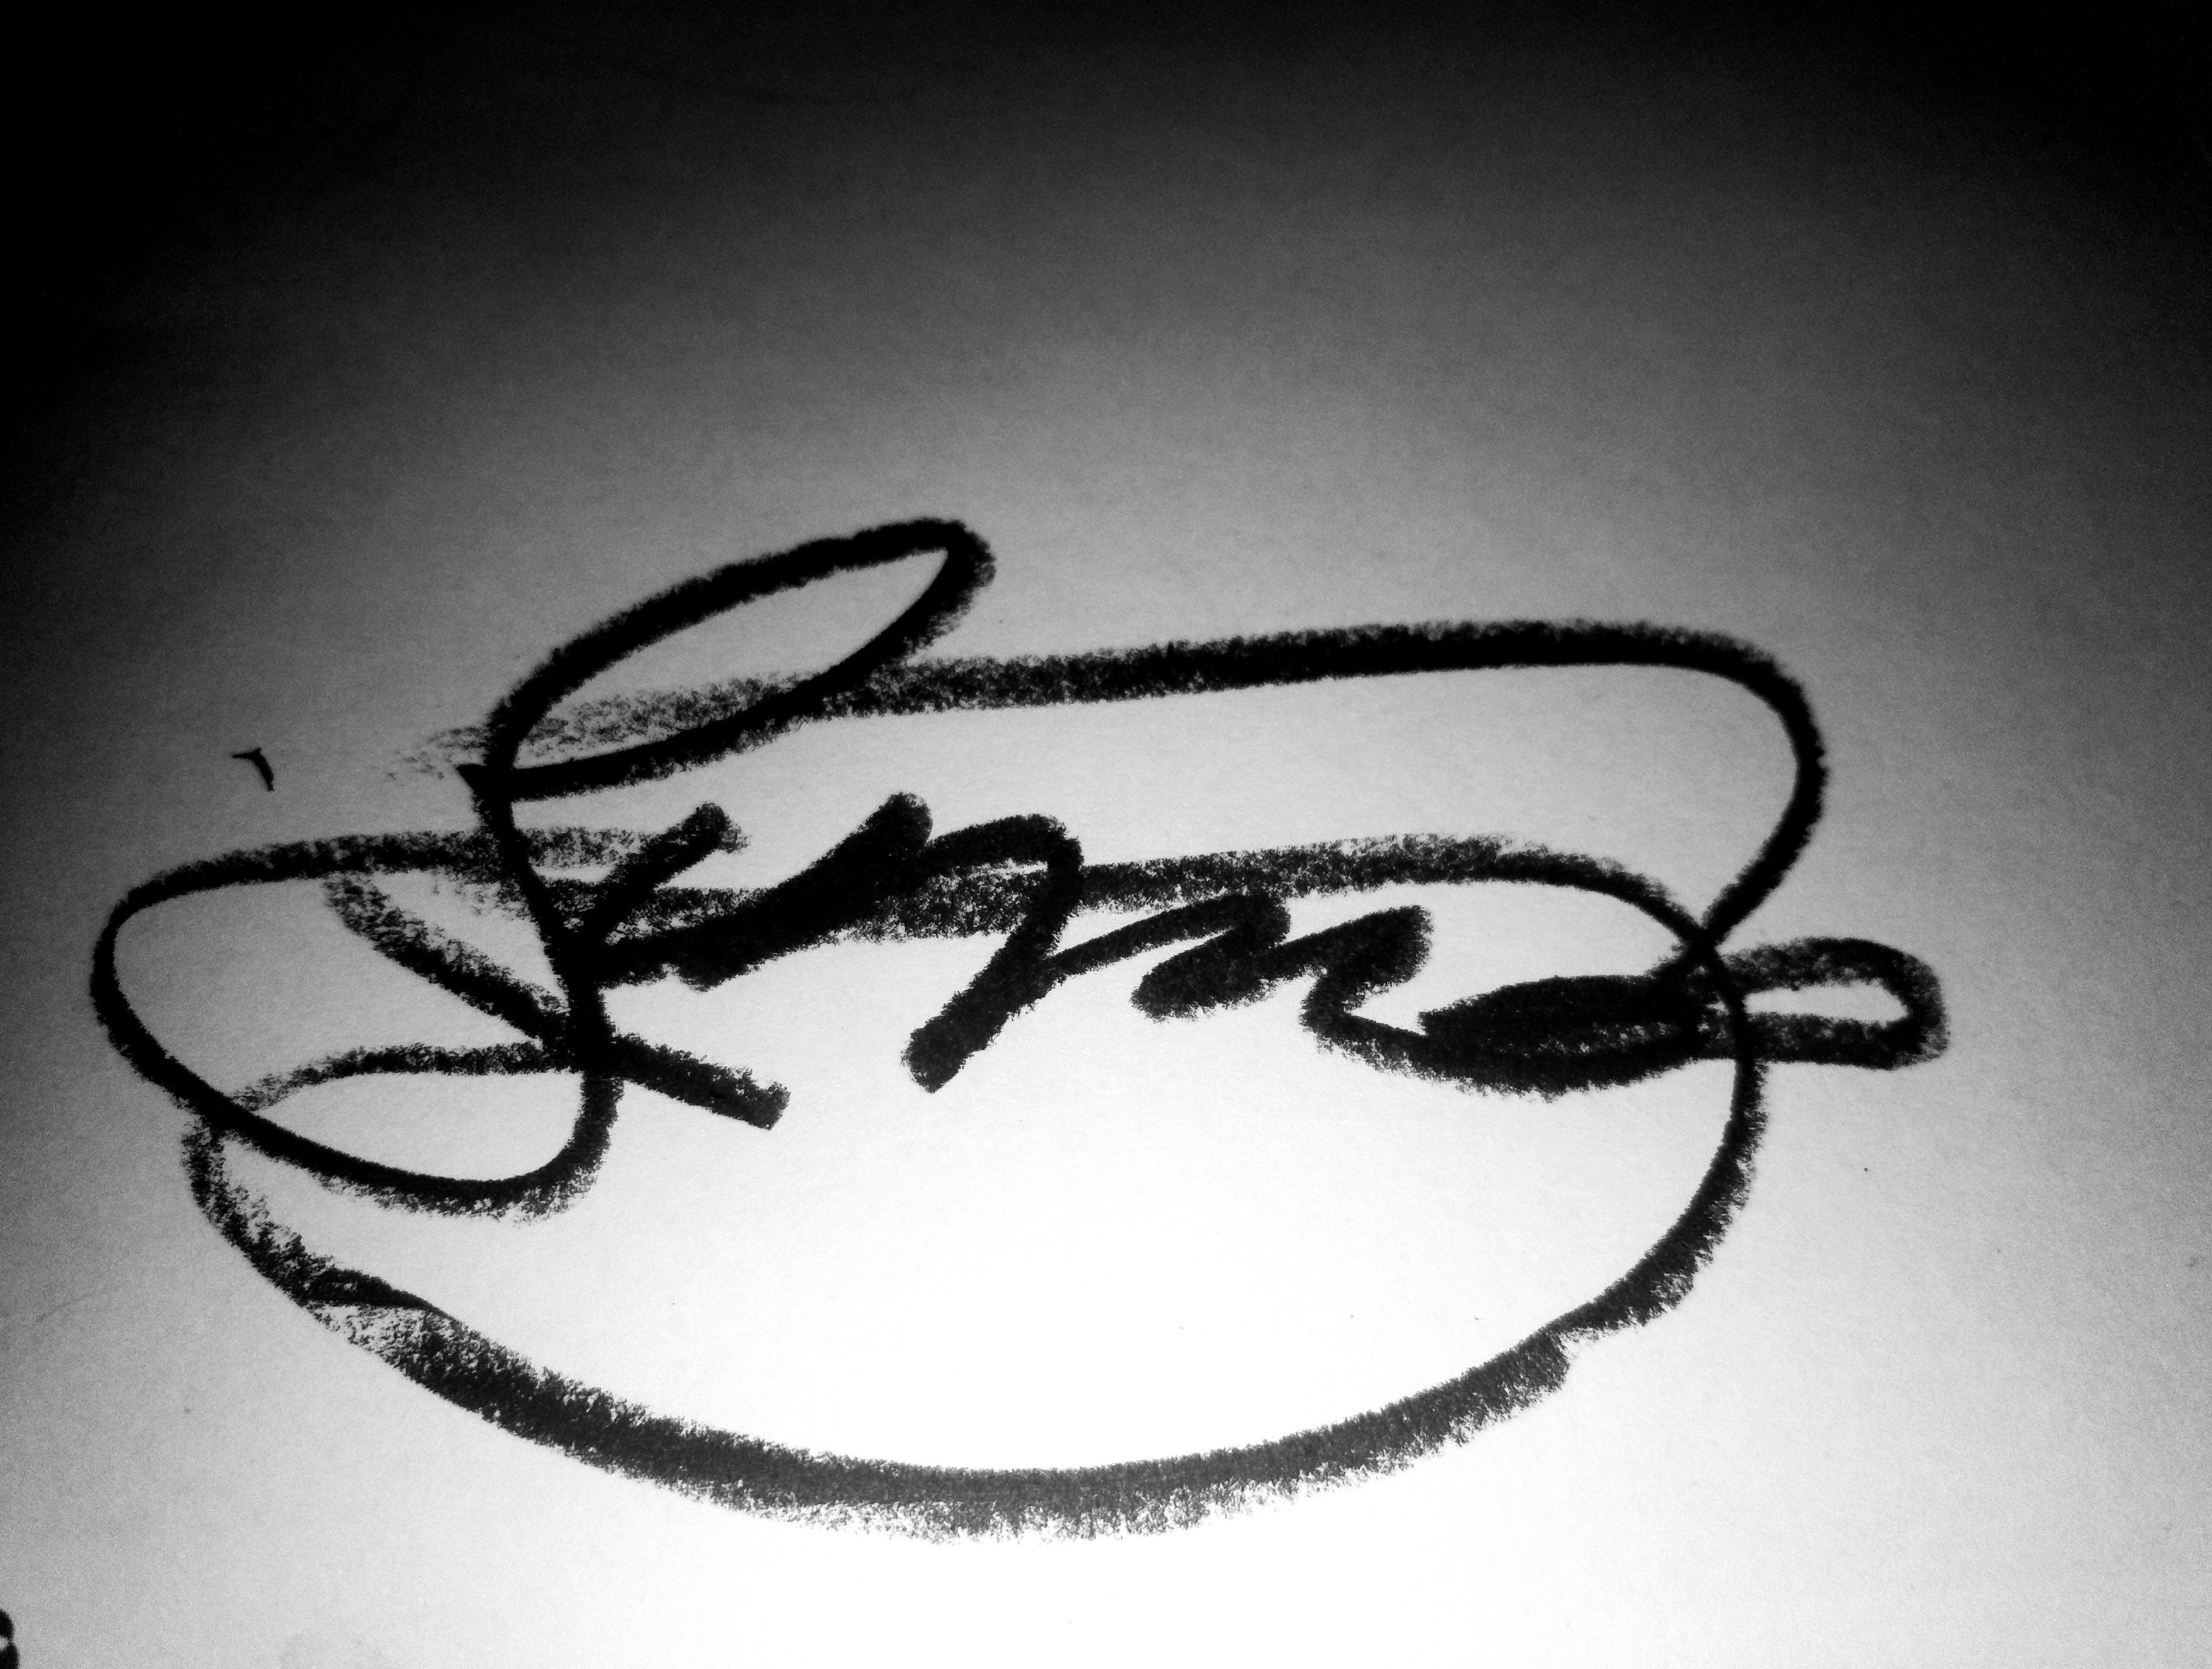 Susanna-Alessandra Sundberg's Signature